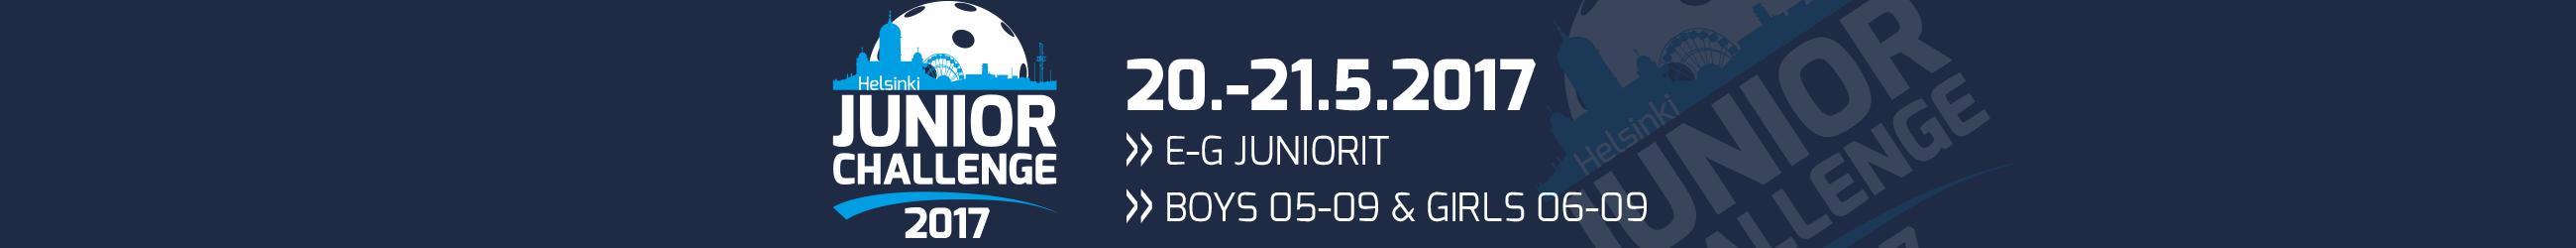 Helsinki Junior Challenge